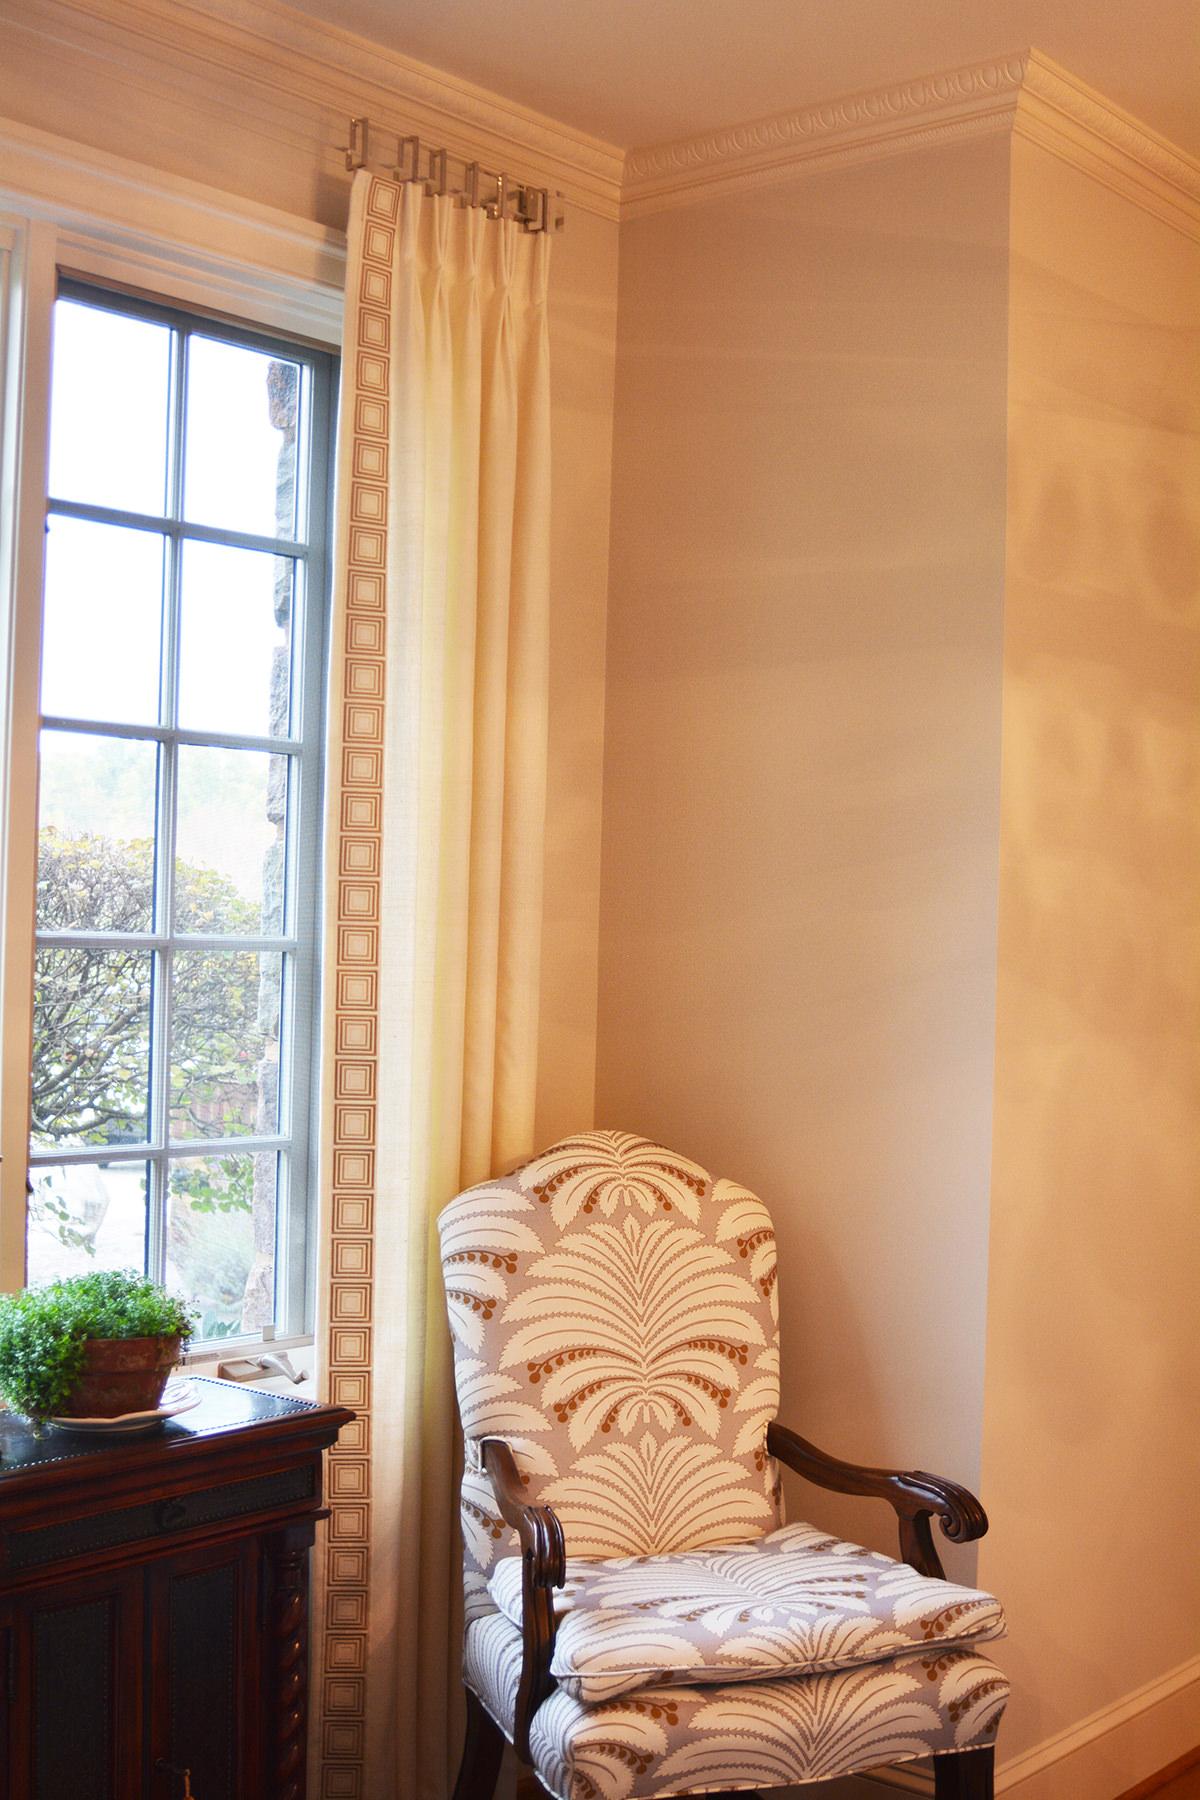 custom-draperies-DBH-designs-willow-street-pennsylvania-4.JPG